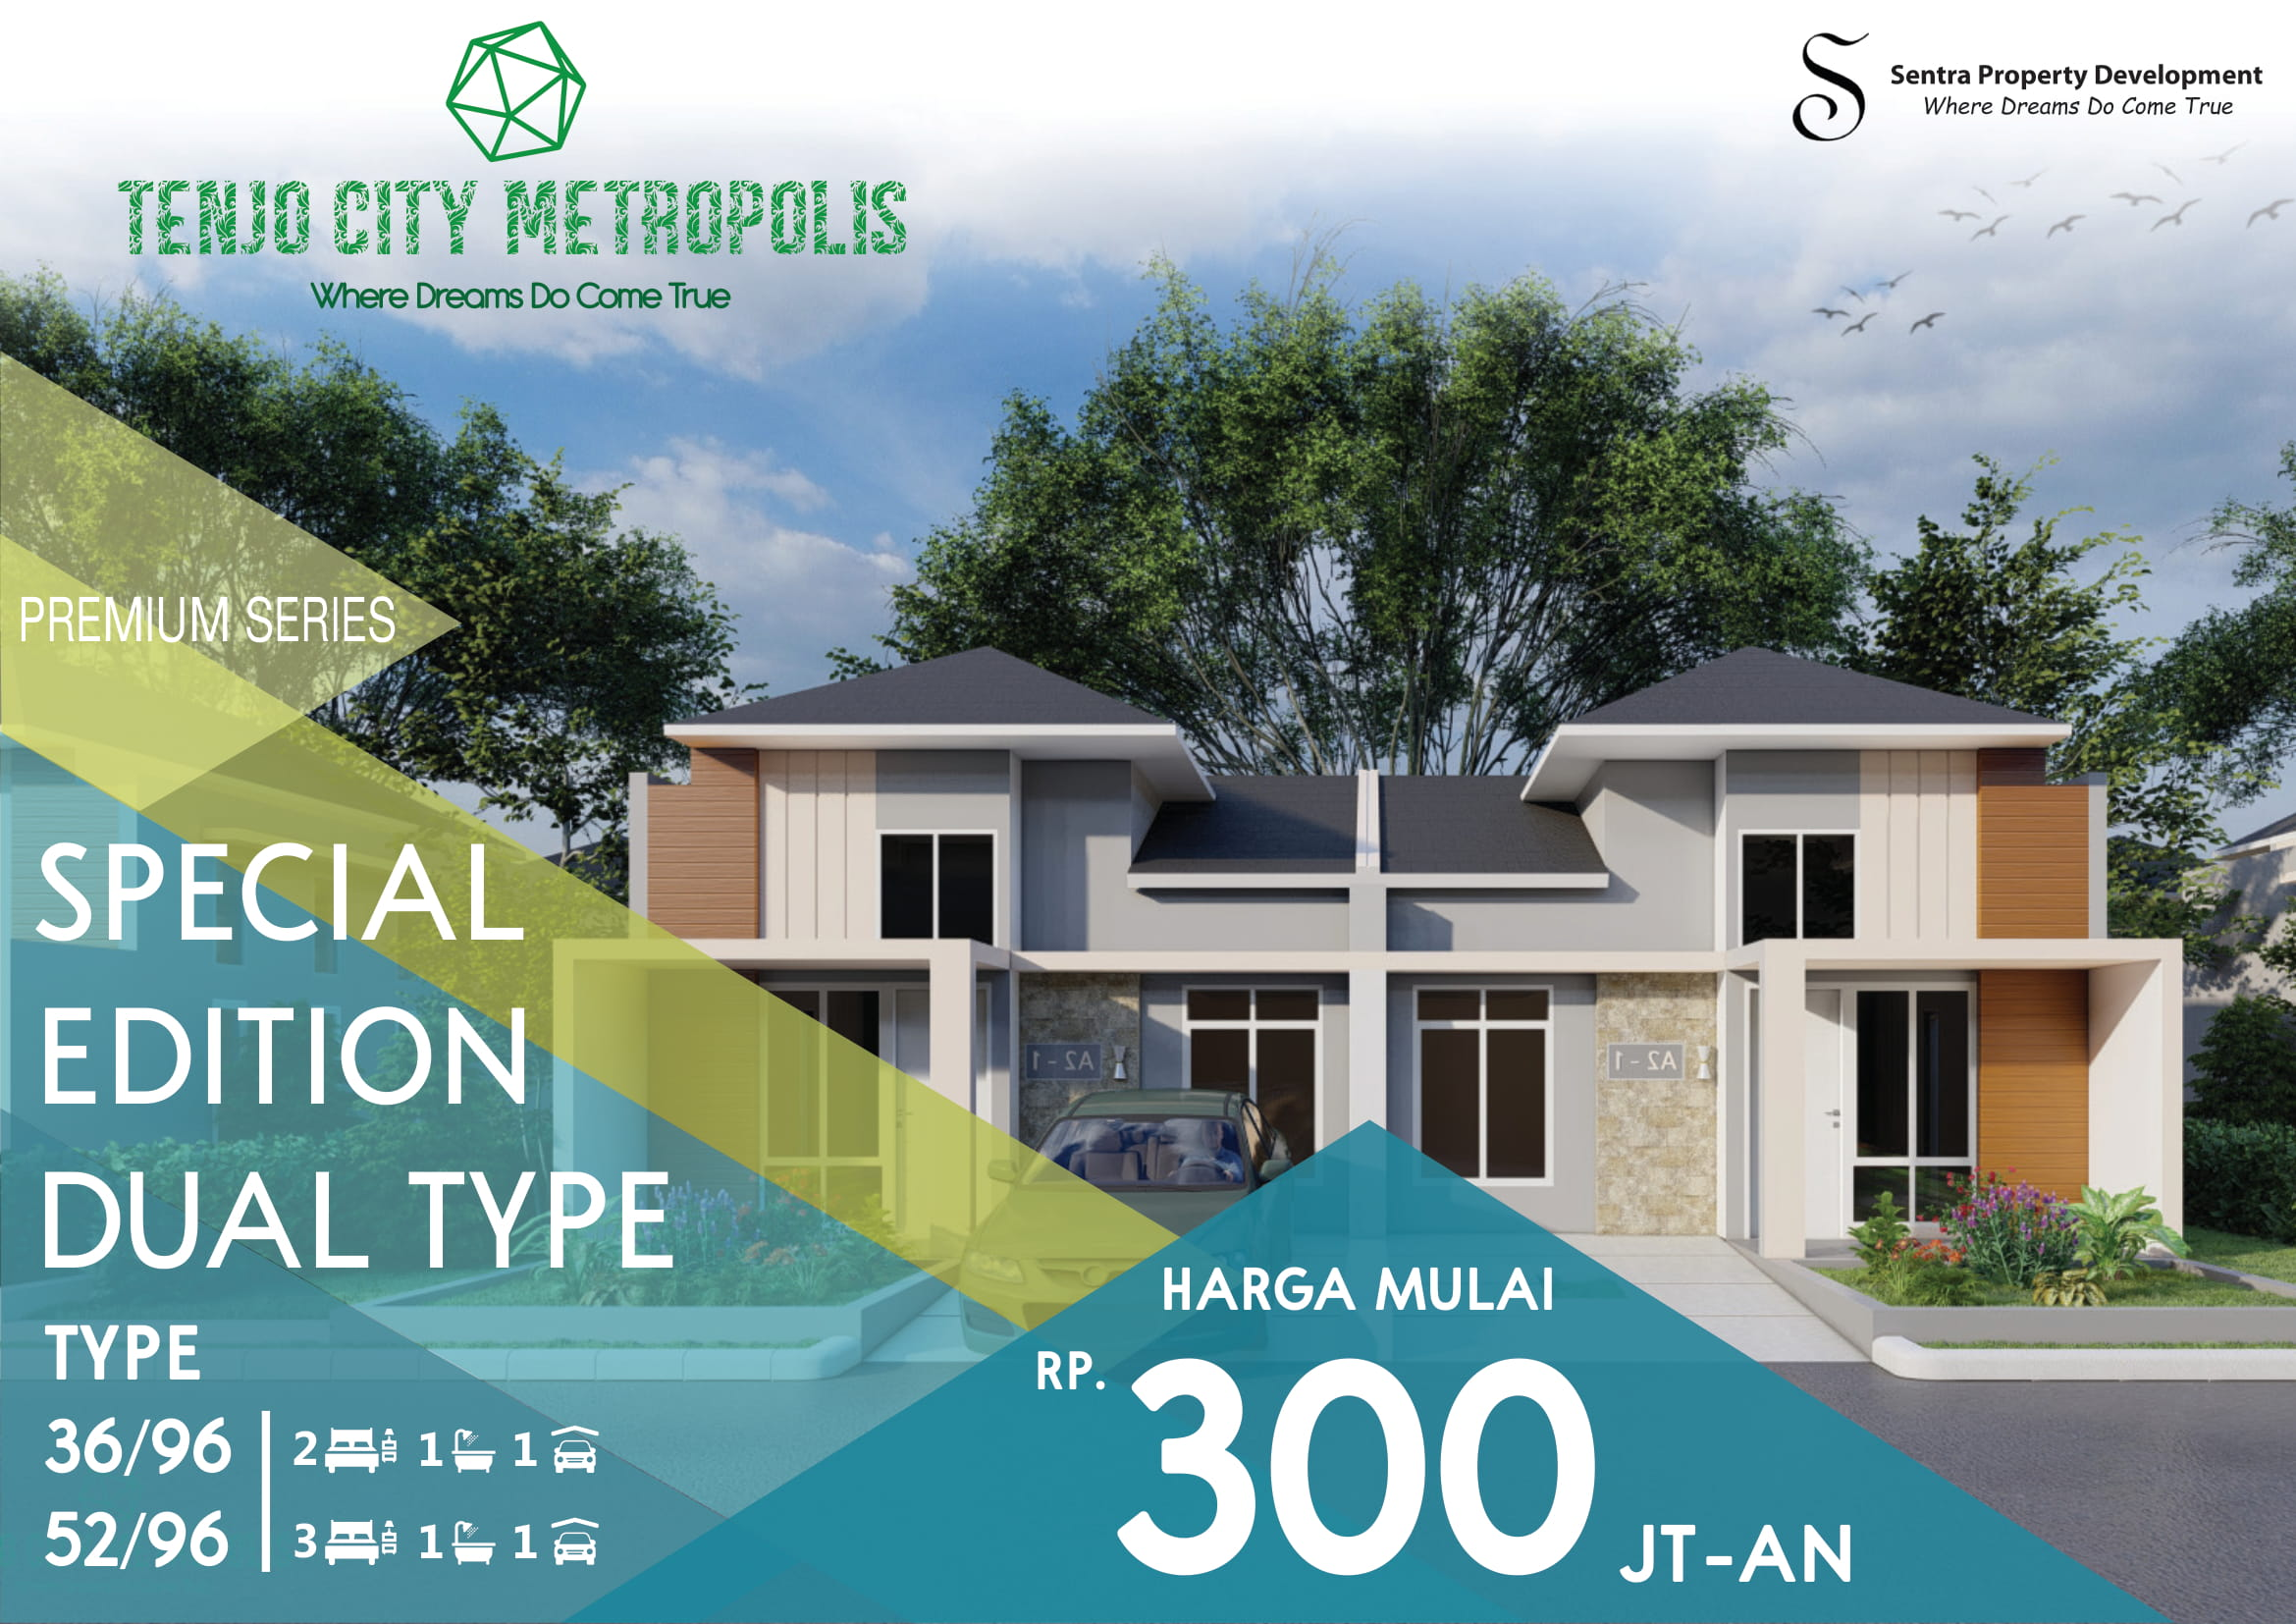 Image - Special Edition Dual Type - Property Millennial - Cluster - Rumah - Apartemen - Ruko